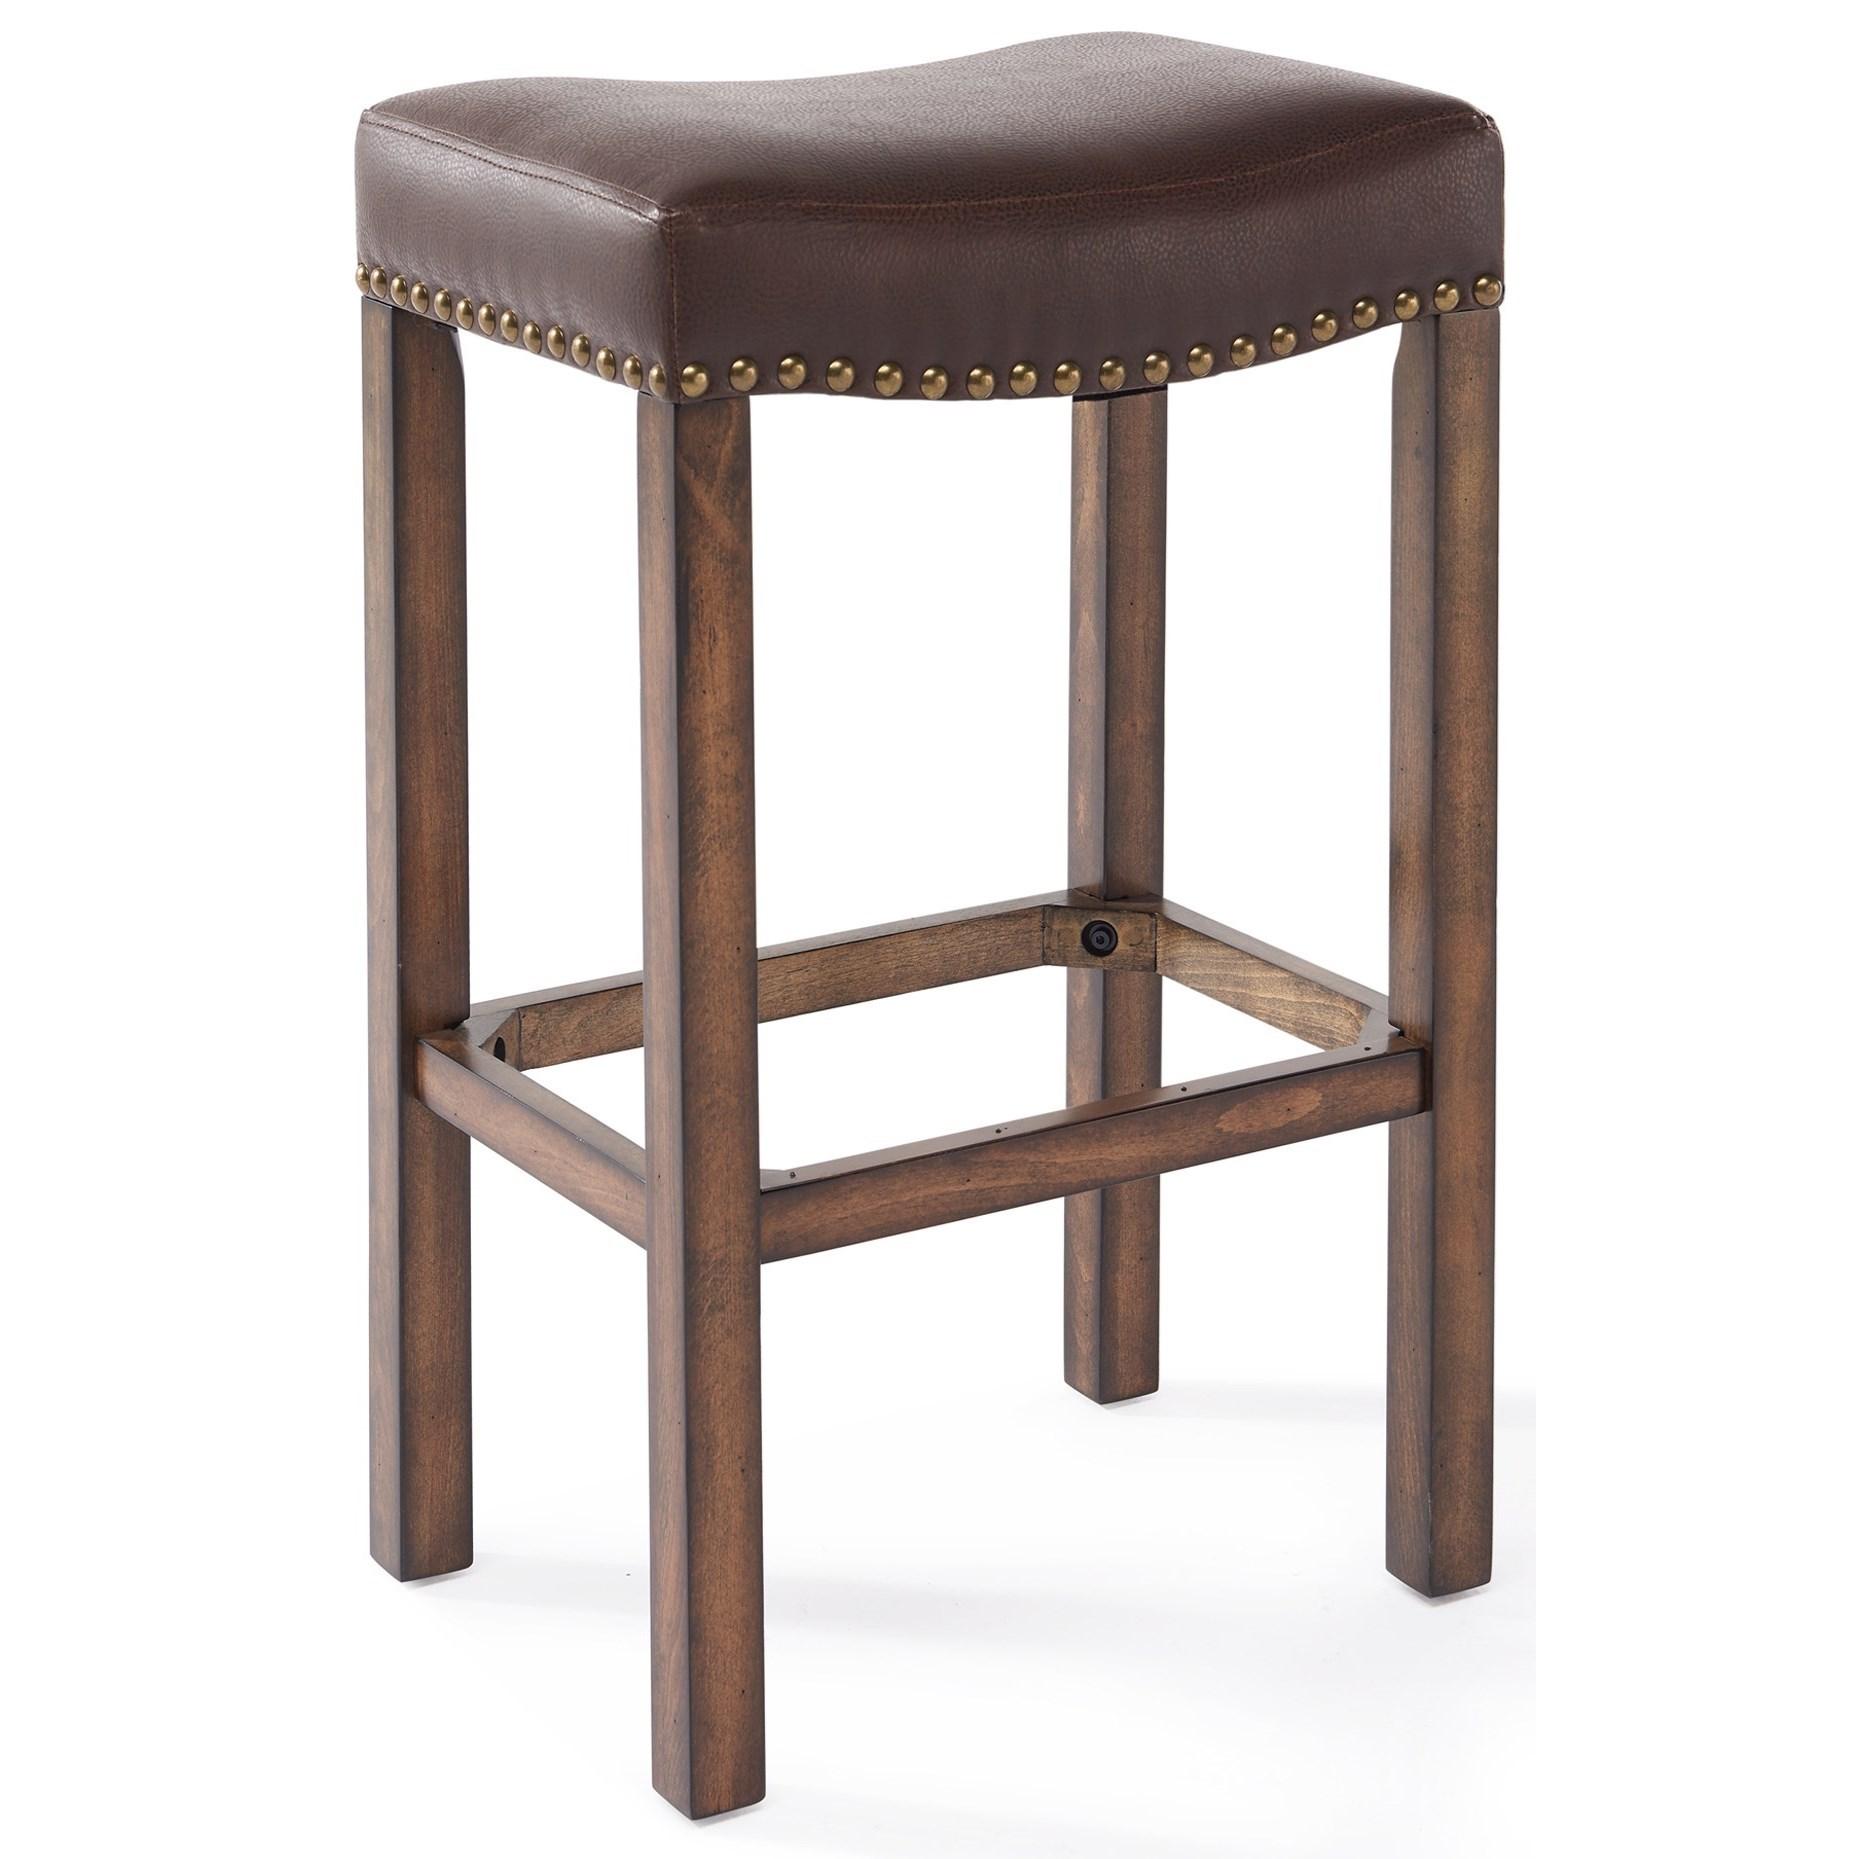 "Tudor 30"" Bar Height Wood Backless Barstool at Sadler's Home Furnishings"